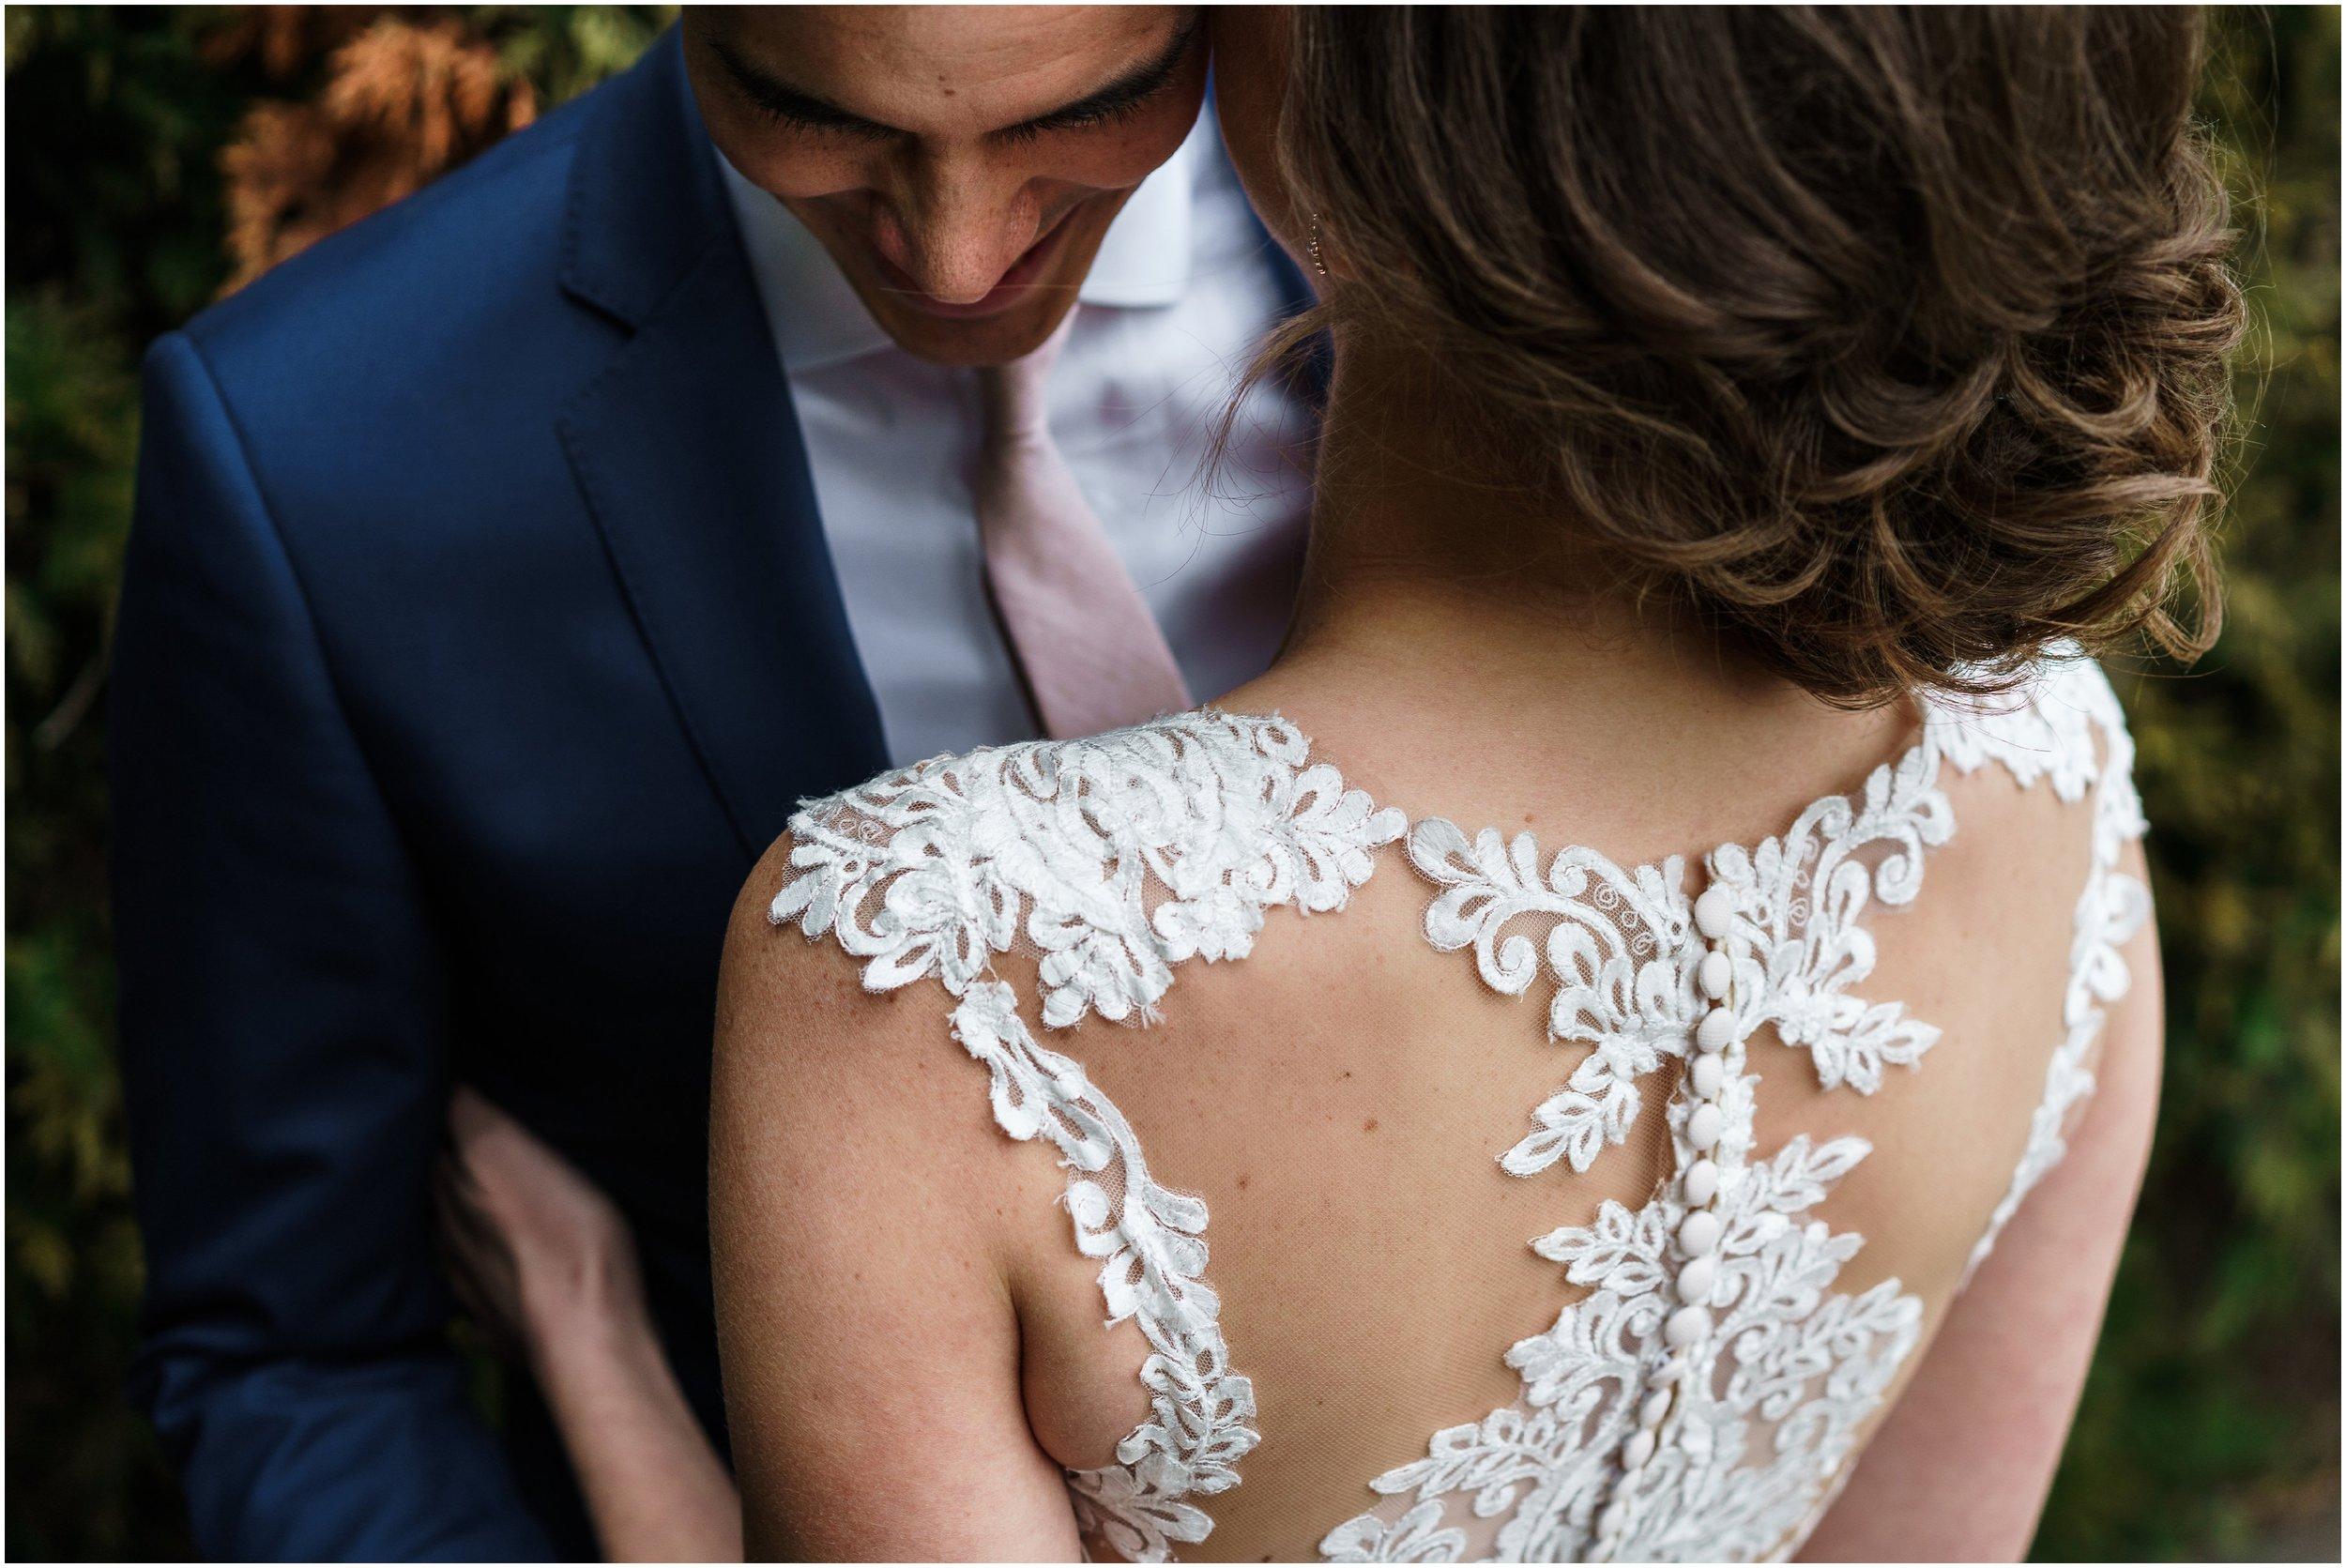 bride and groom embracing in Millennium park's Lurie garden